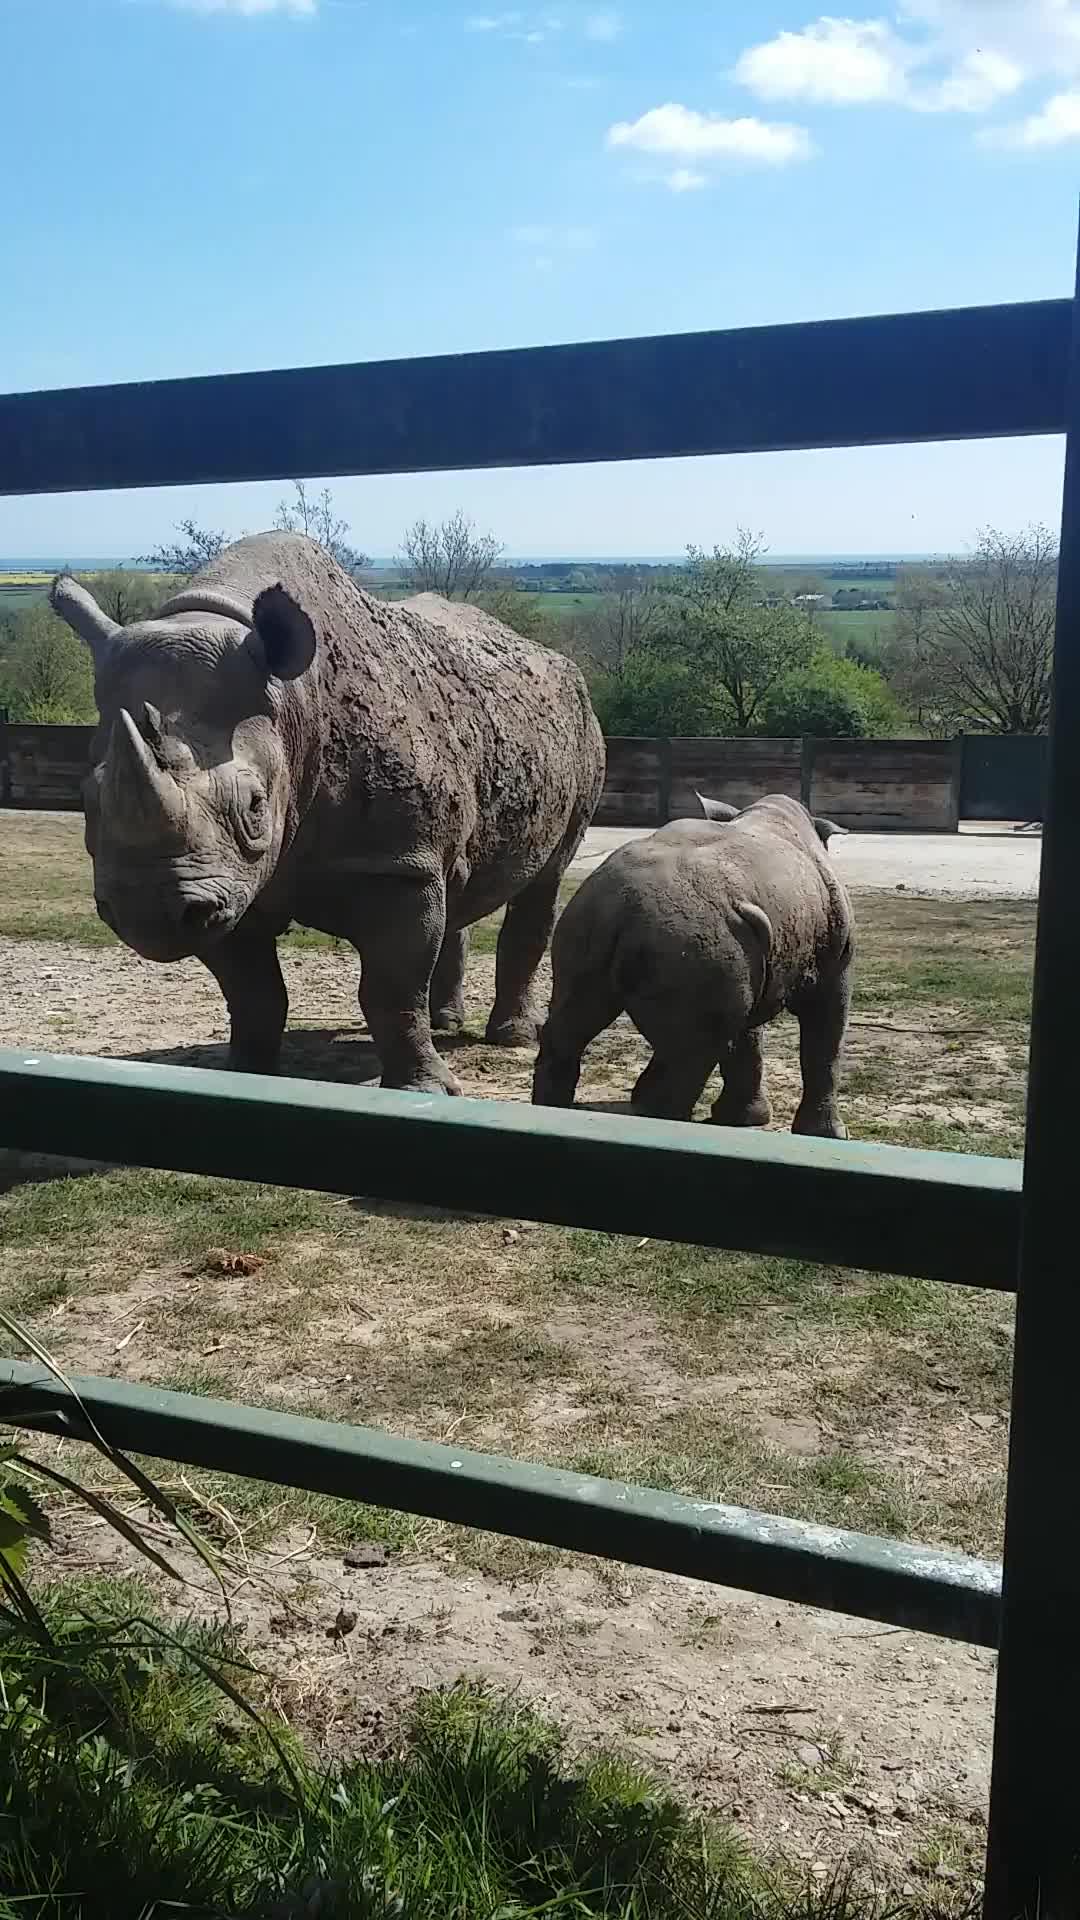 Rhino baby rhino zoo charging protect protecting scary so cl, Mum rhino charging to protect baby. GIFs